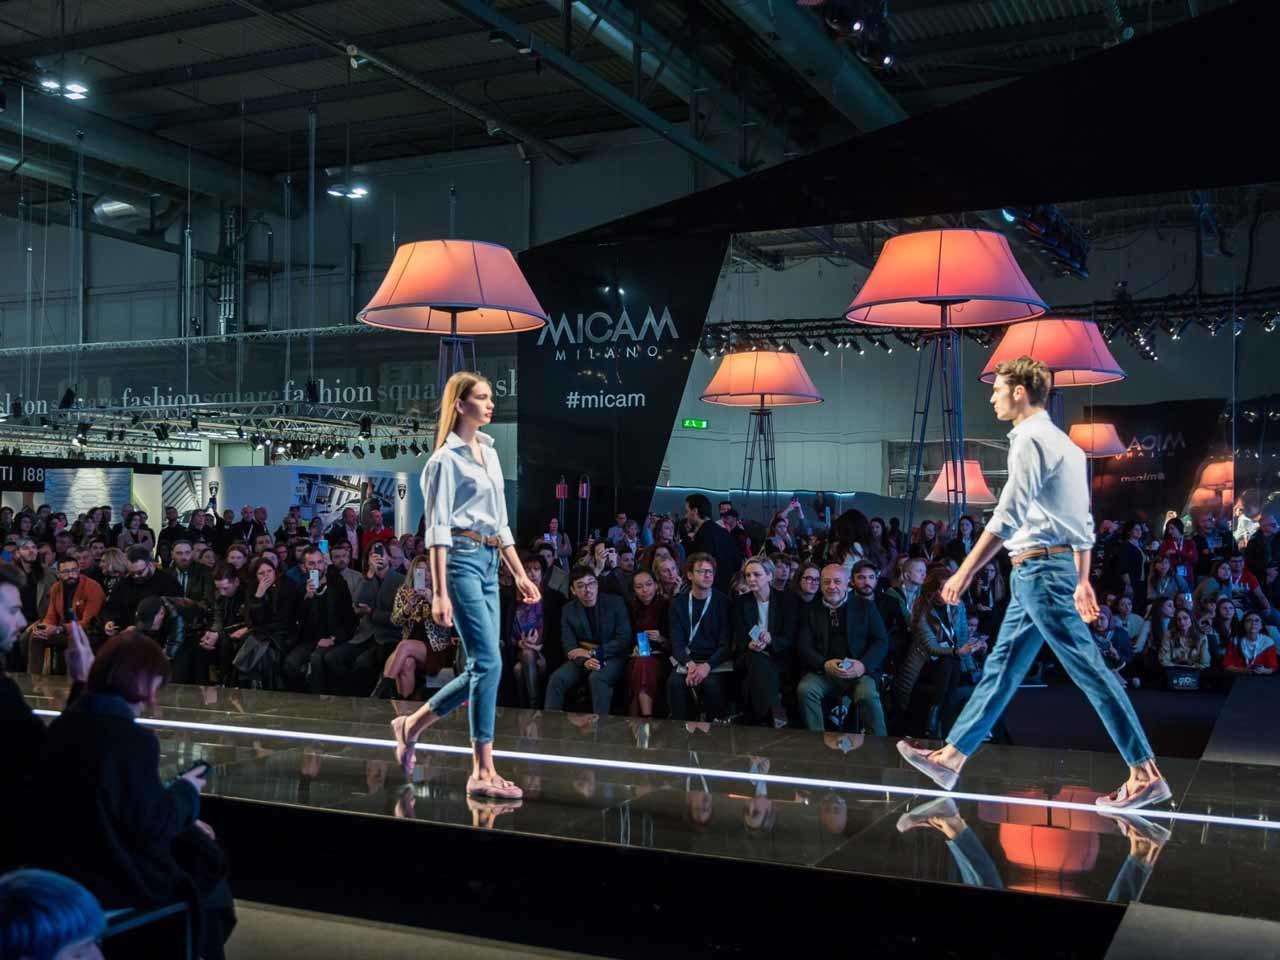 MICAM show chaussure Italie